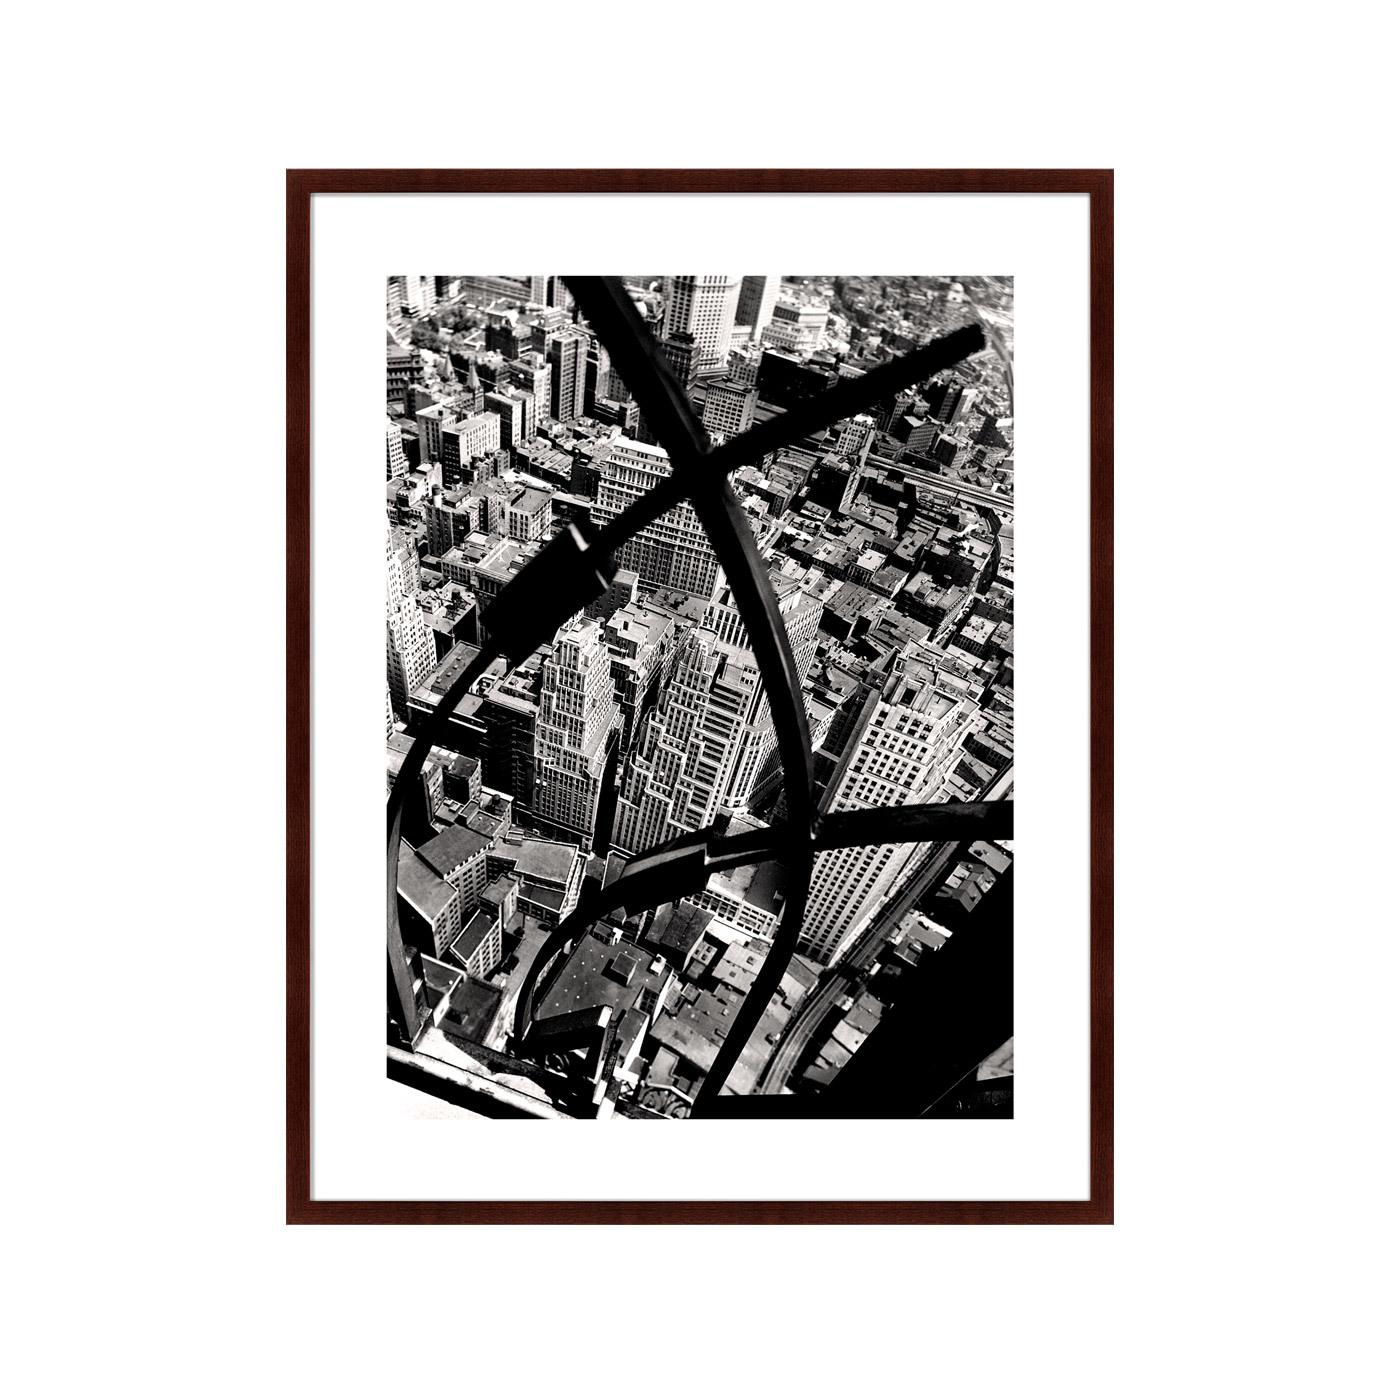 {} Картины в Квартиру Картина Улицы Нью-Йорка (102х130 см) картины в квартиру картина дерево на воде 102х130 см